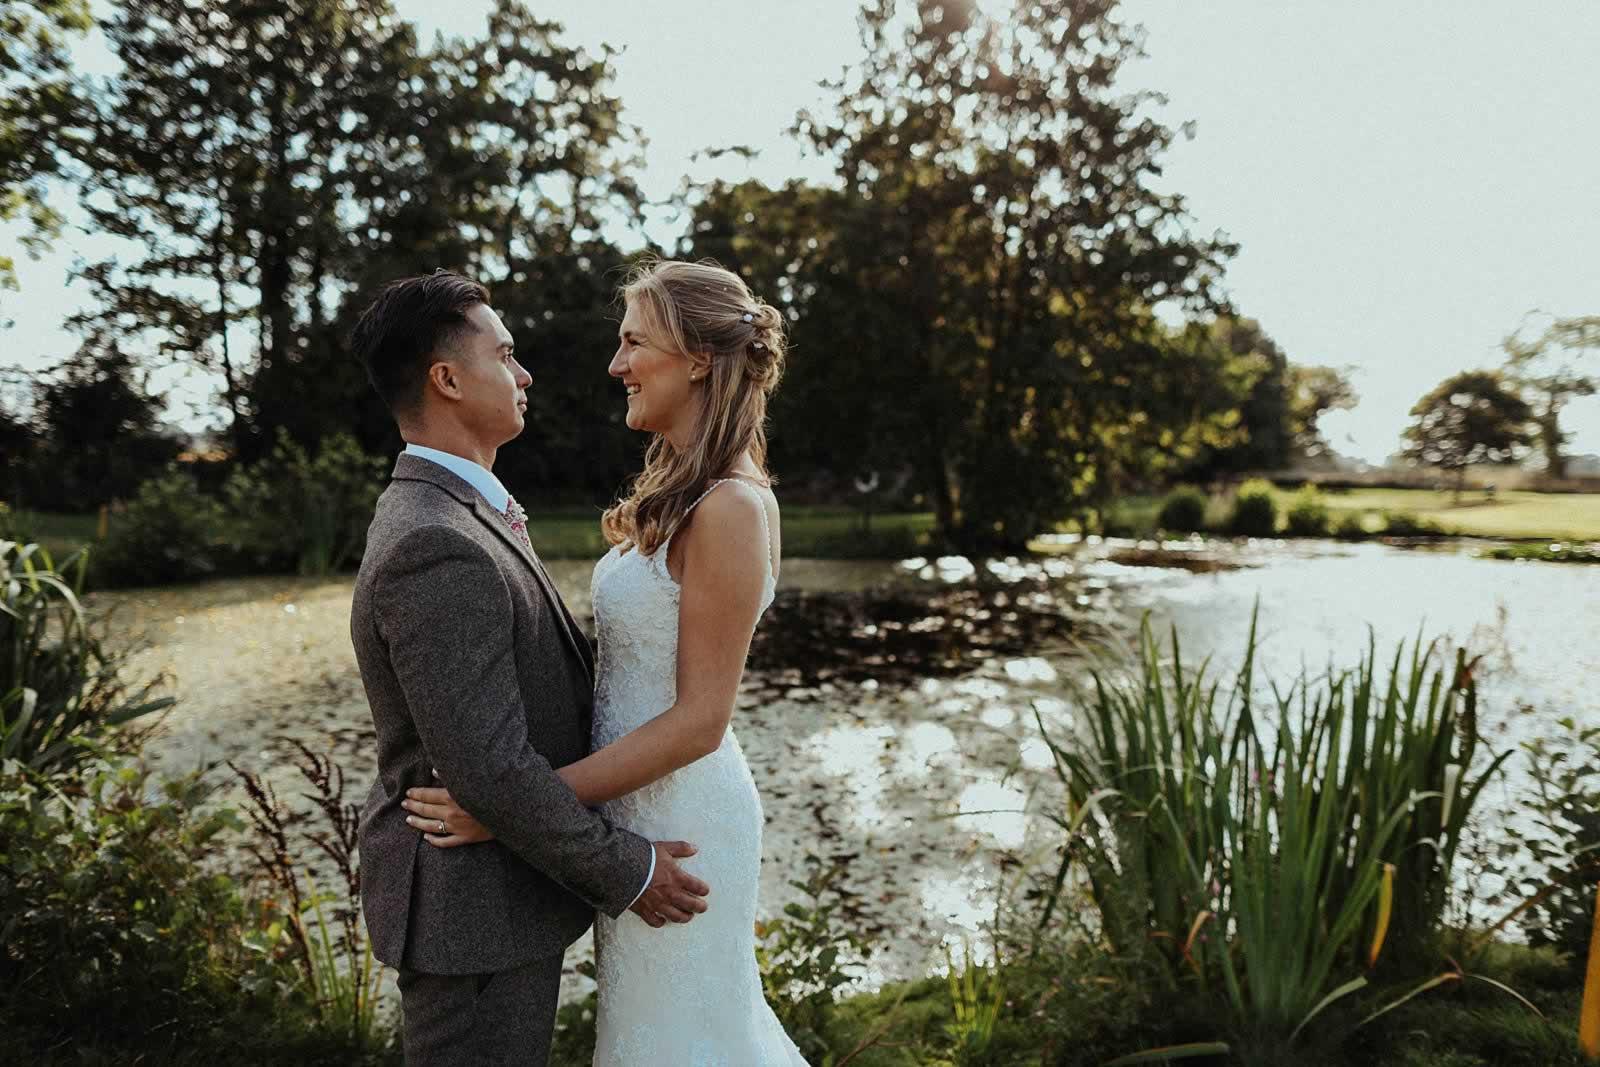 Pryors-Hayes-Wedding-Photography-Barn-Venue-Cheshire-embee-photography-0161.jpg